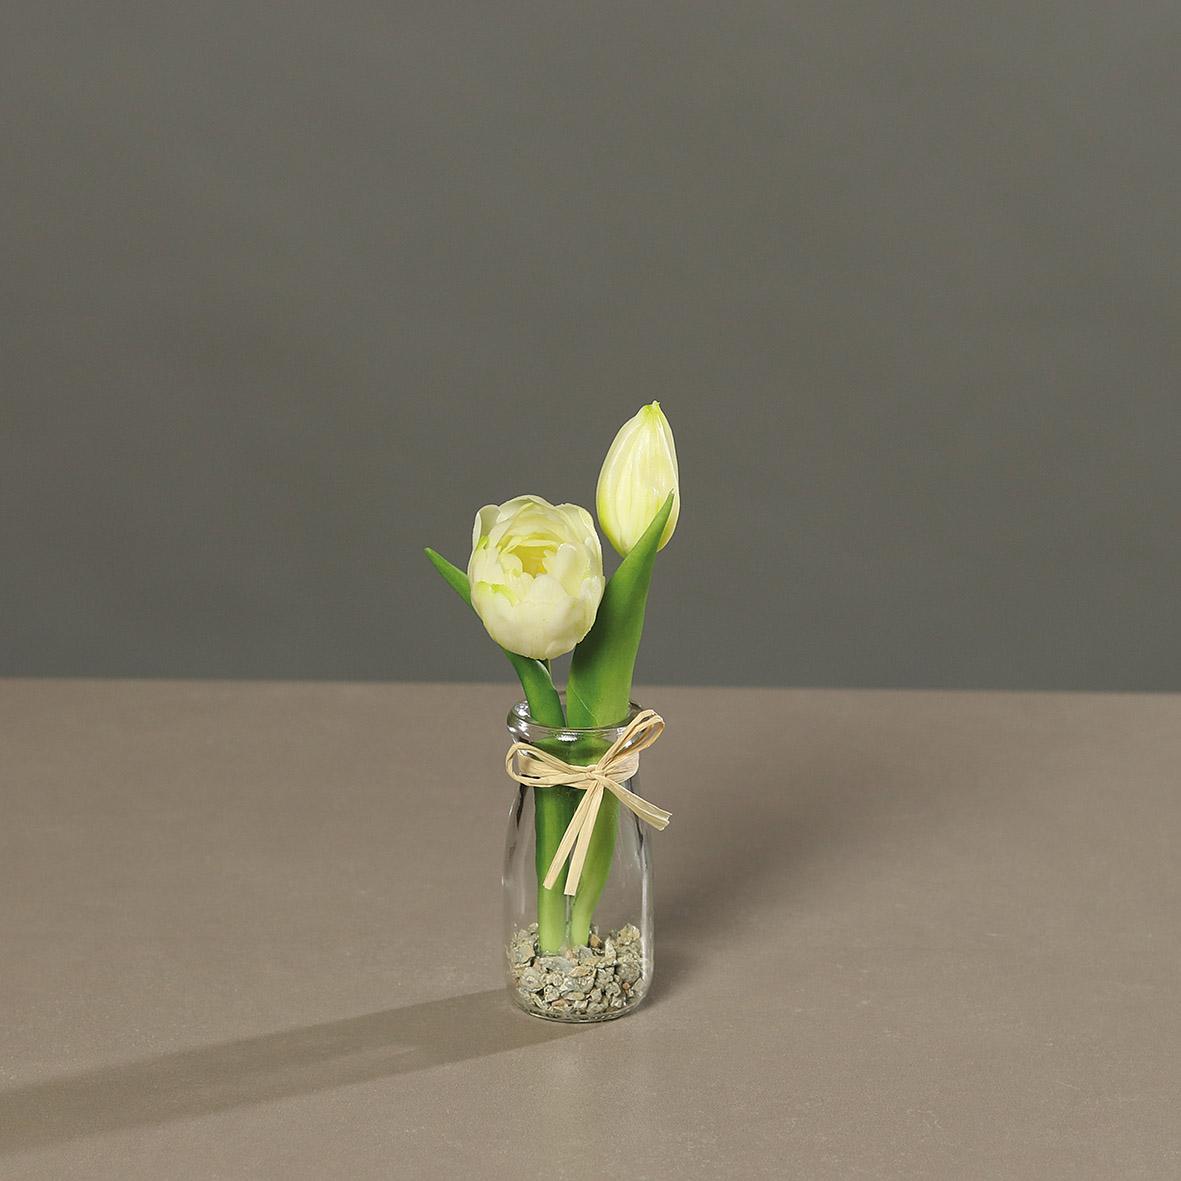 Tulpenarrangement im Glas